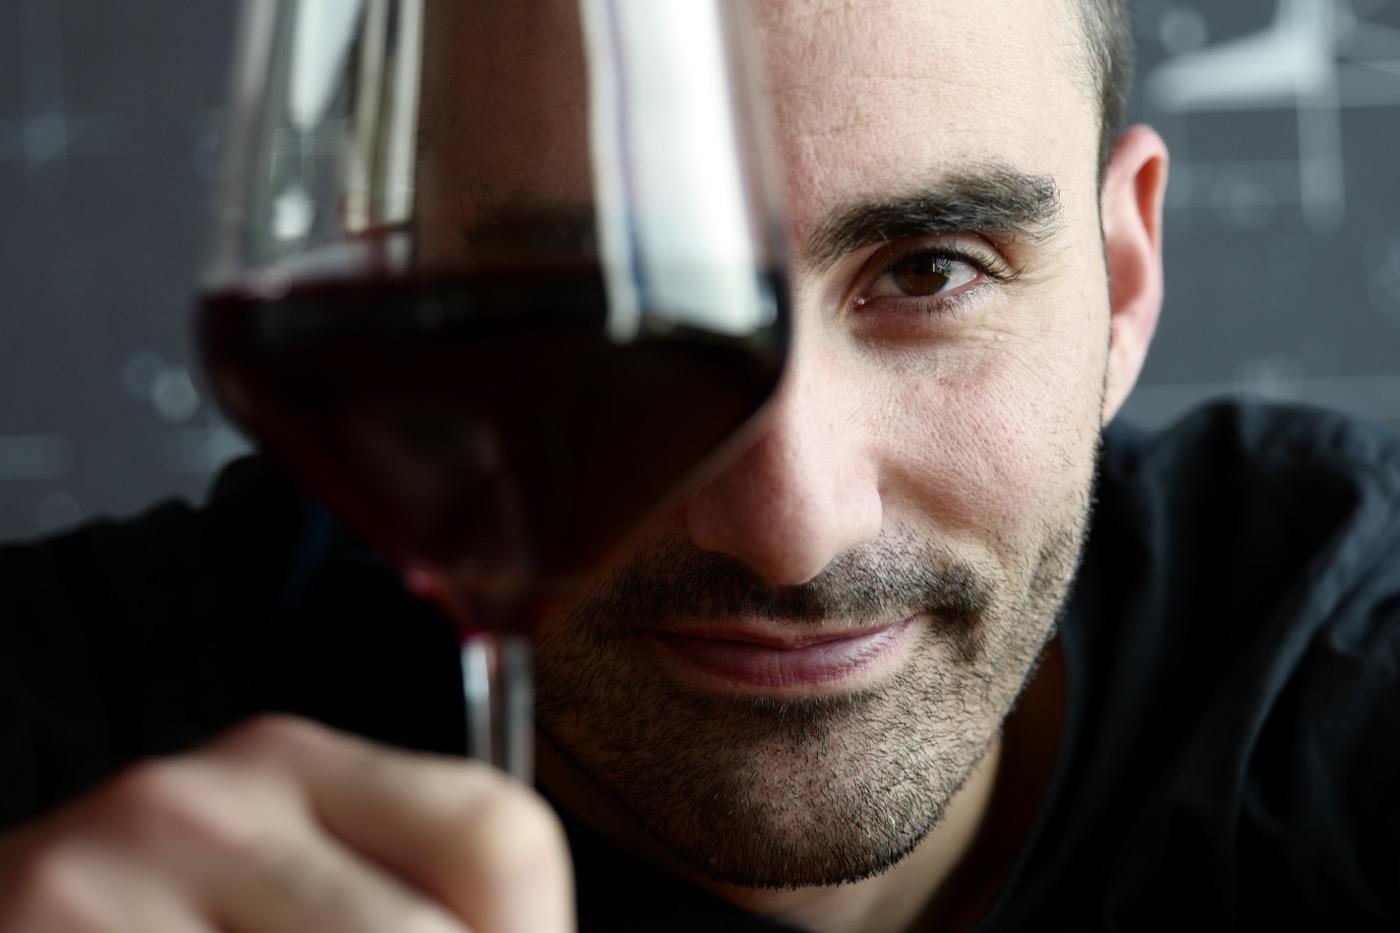 Sauro-Maule-vision-wine-maker-portrait_L1160038_or_1400